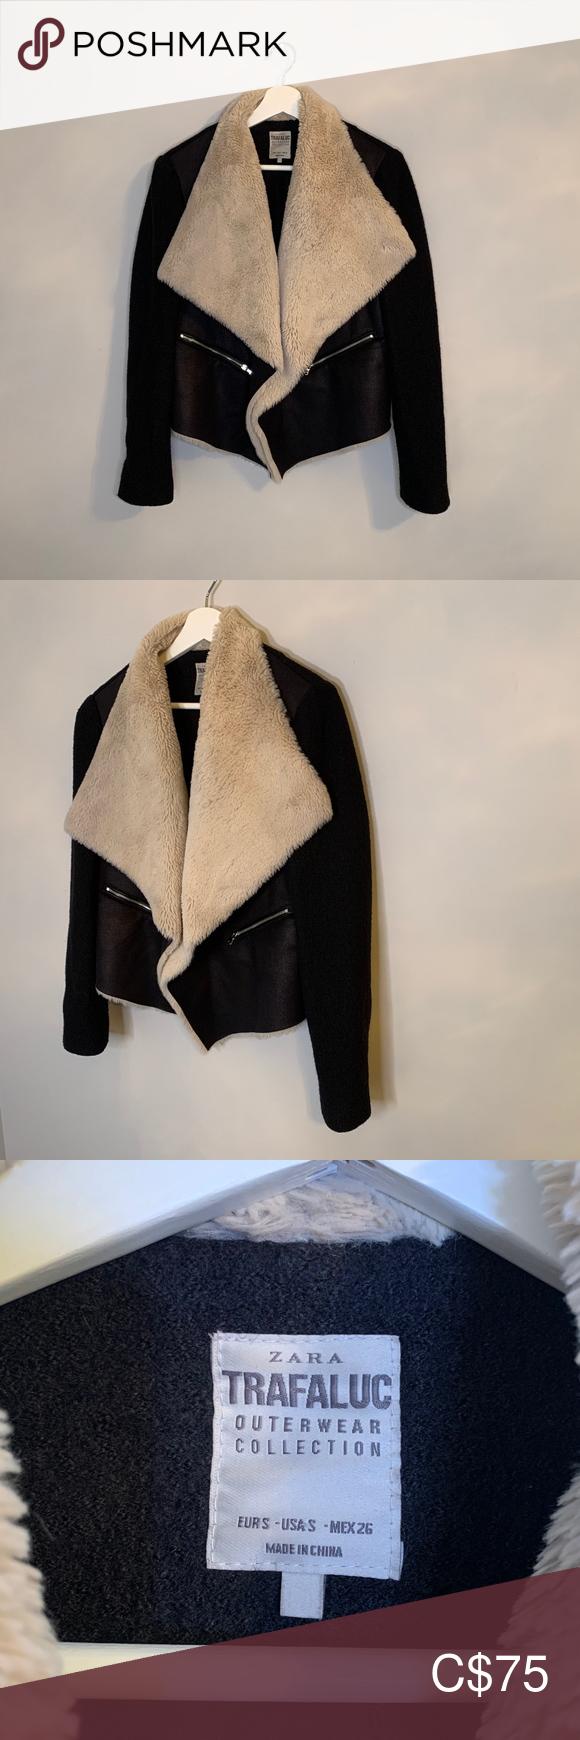 Zara Trafaluc Outerwear Collection Jacket Clothes Design Women Shopping Outerwear [ 1740 x 580 Pixel ]